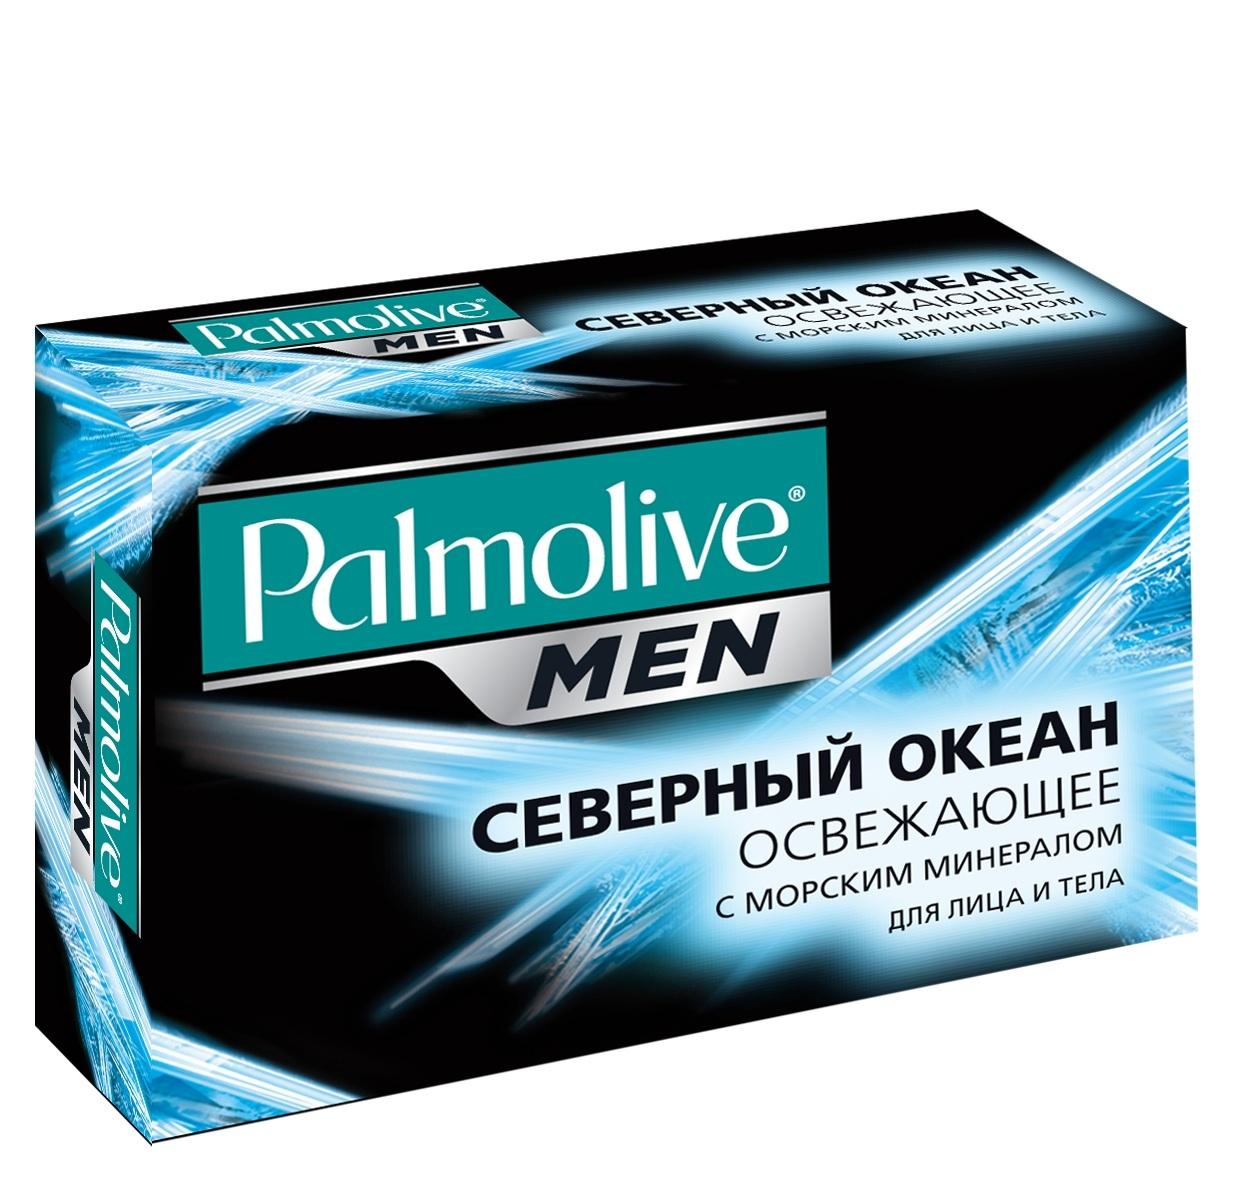 Palmolive Мыло туалетное Palmolive Men